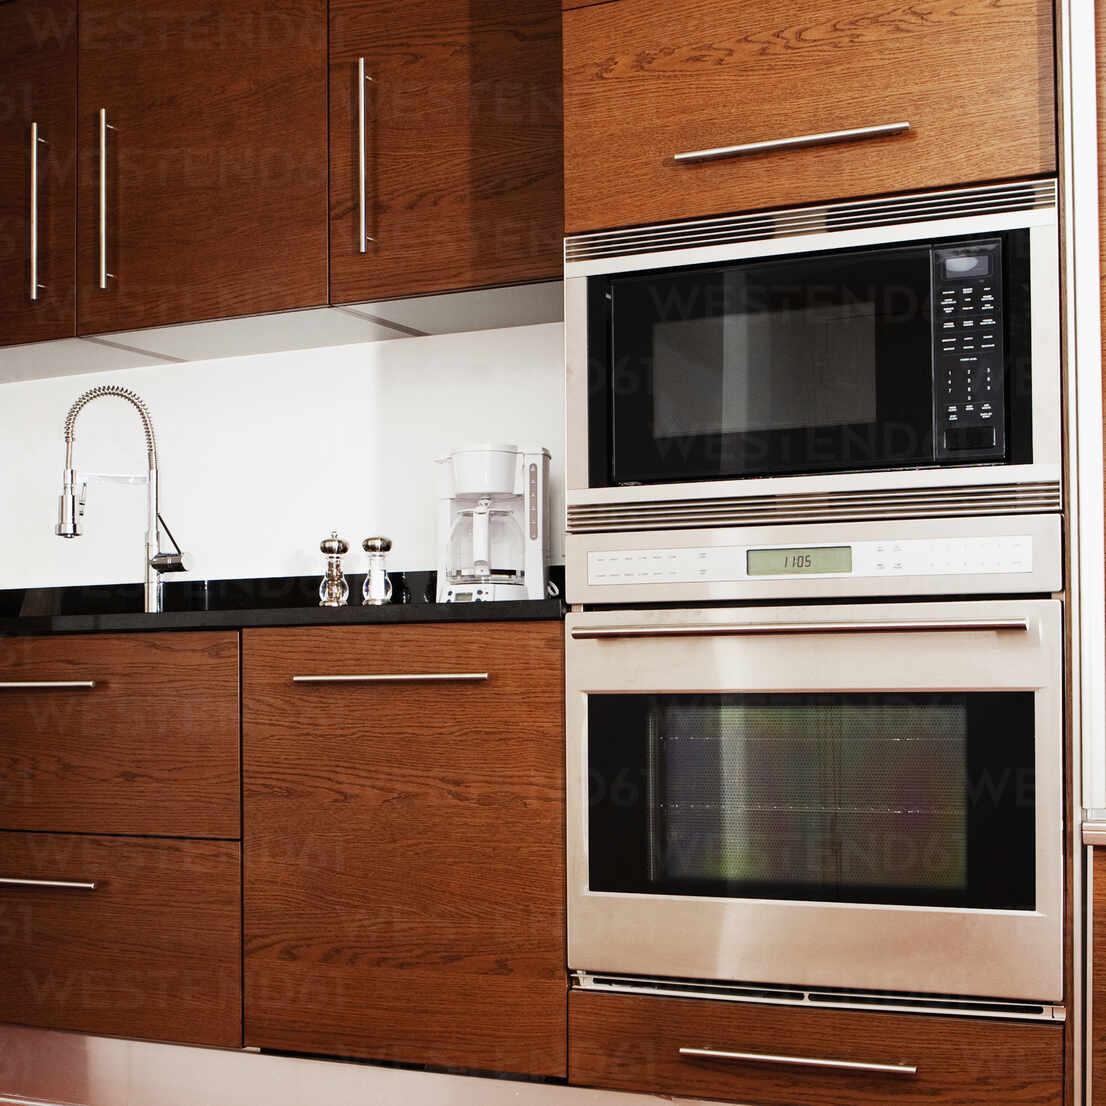 https www westend61 de en imageview blef13230 oven microwave cabinets and sink in modern kitchen